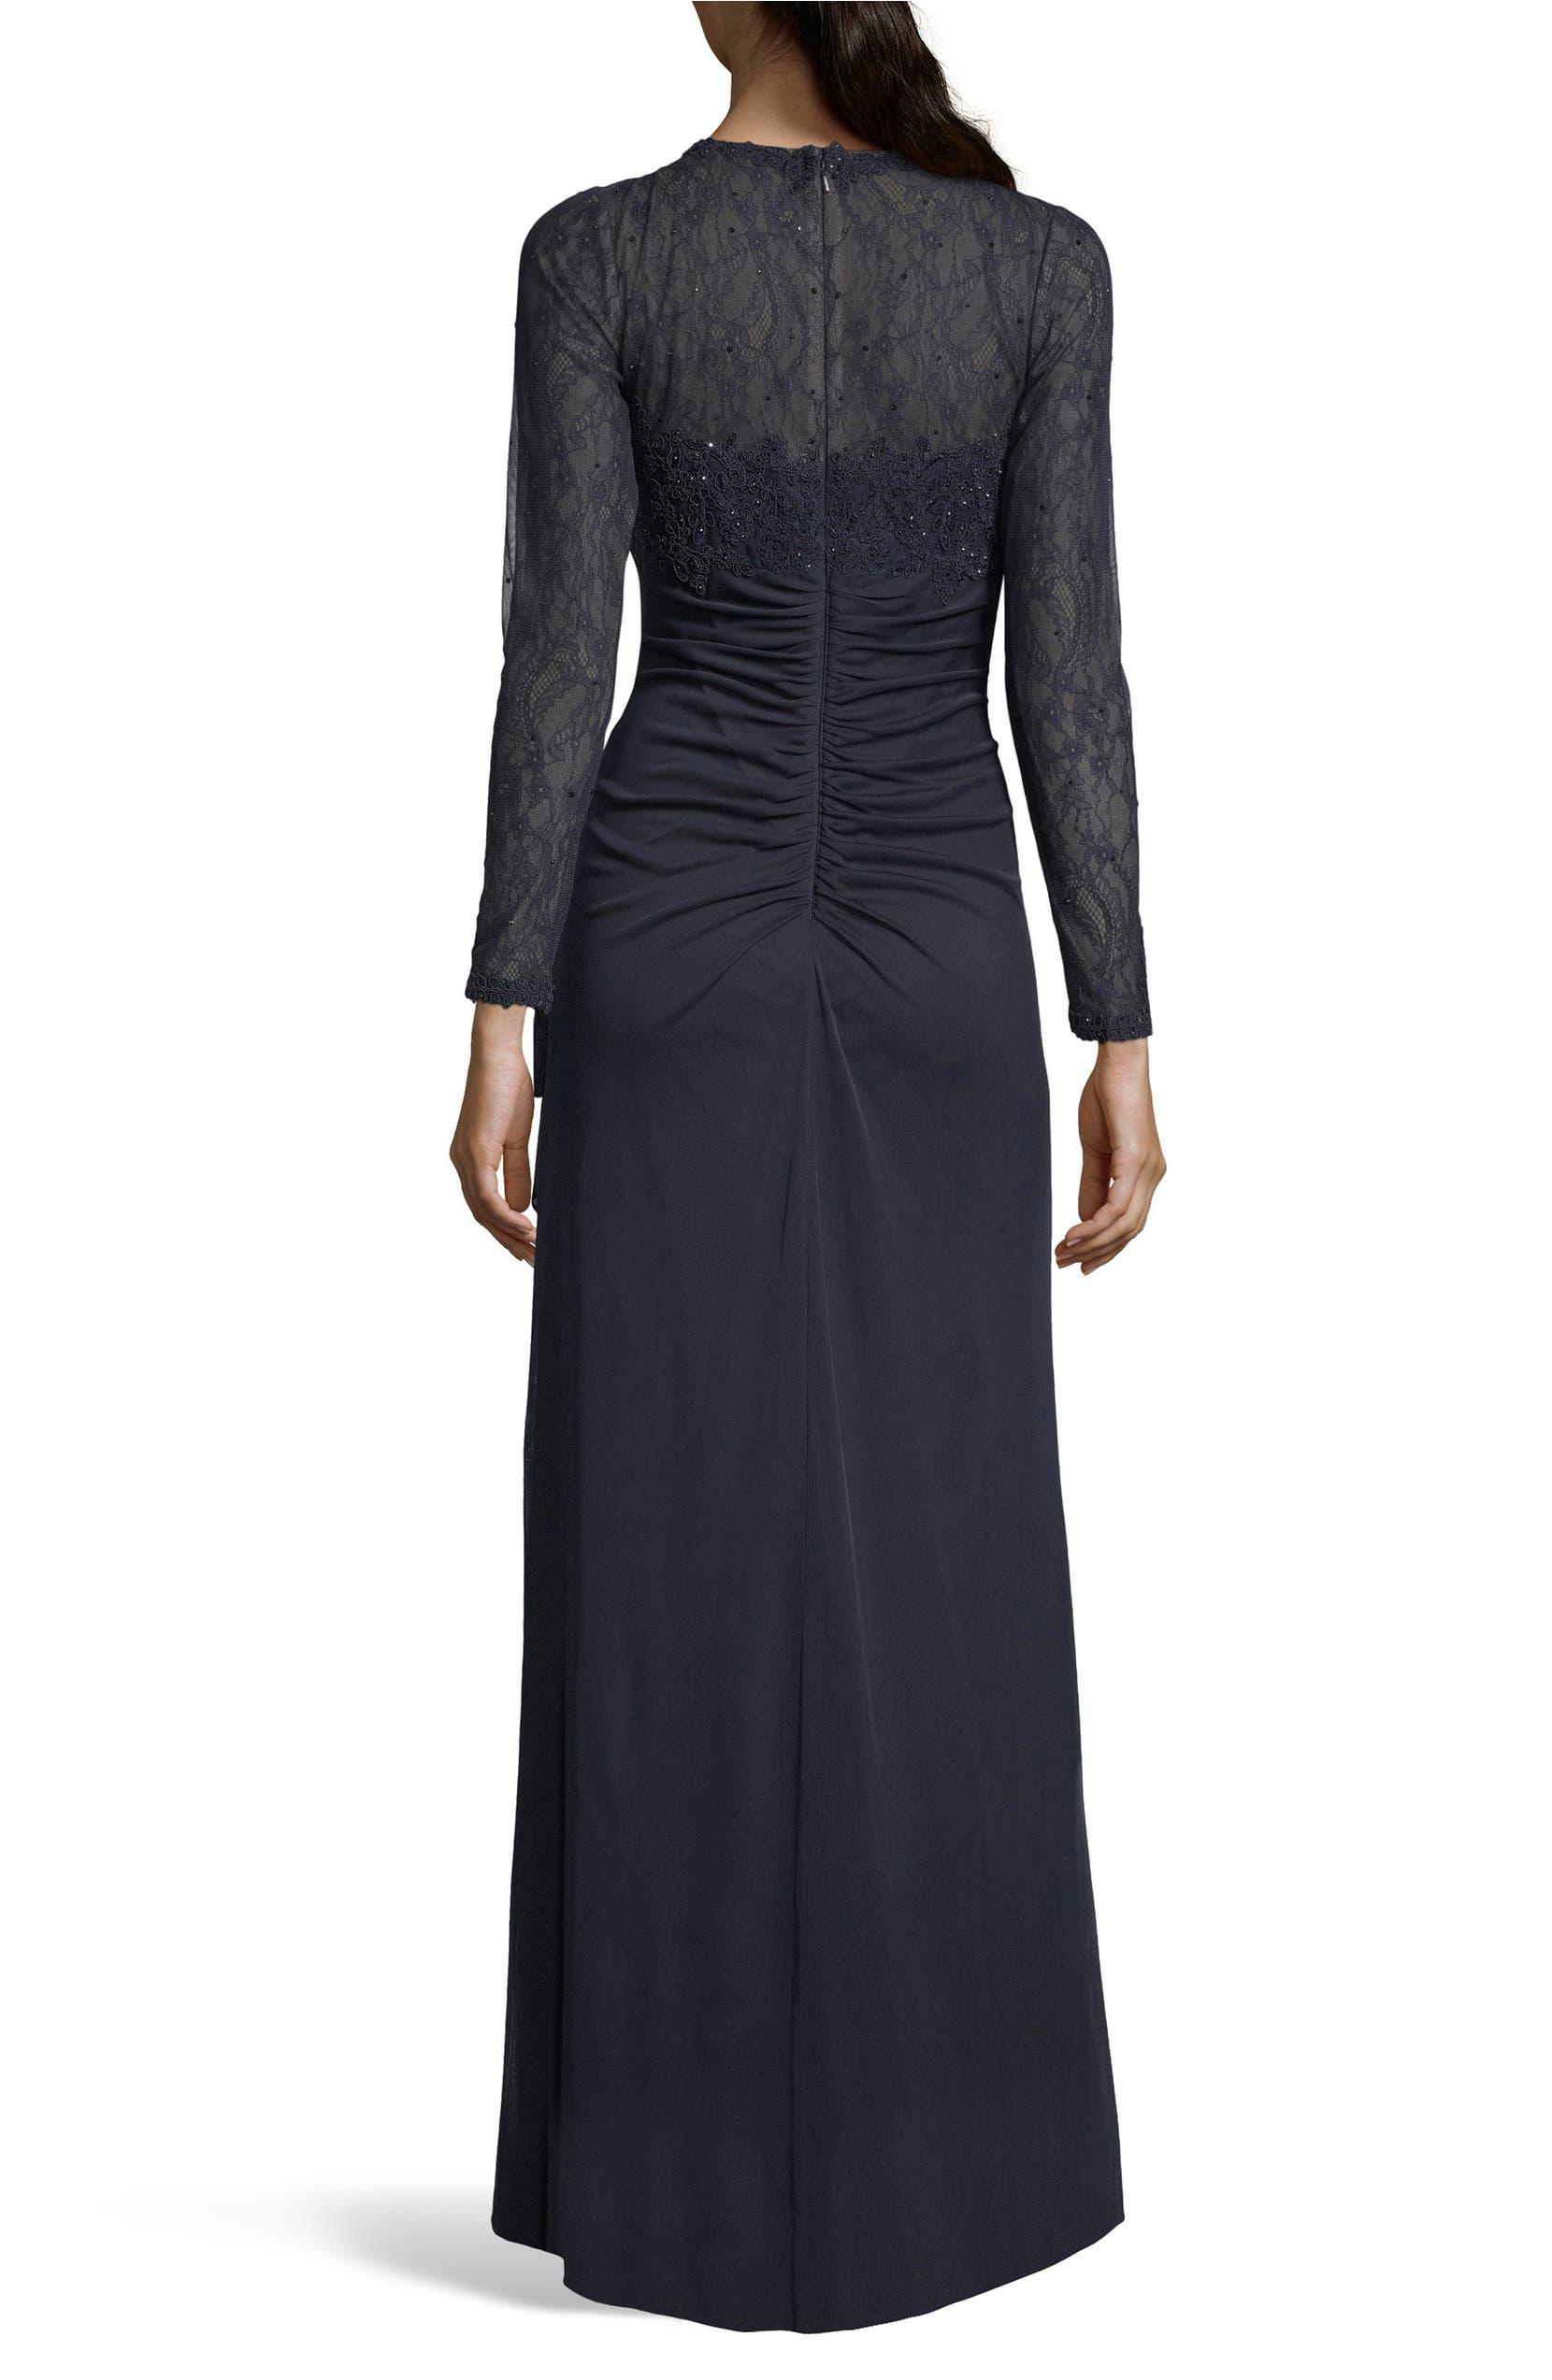 Xscape Lace Bodice Ruched Evening Dress (Regular & Plus Size ...